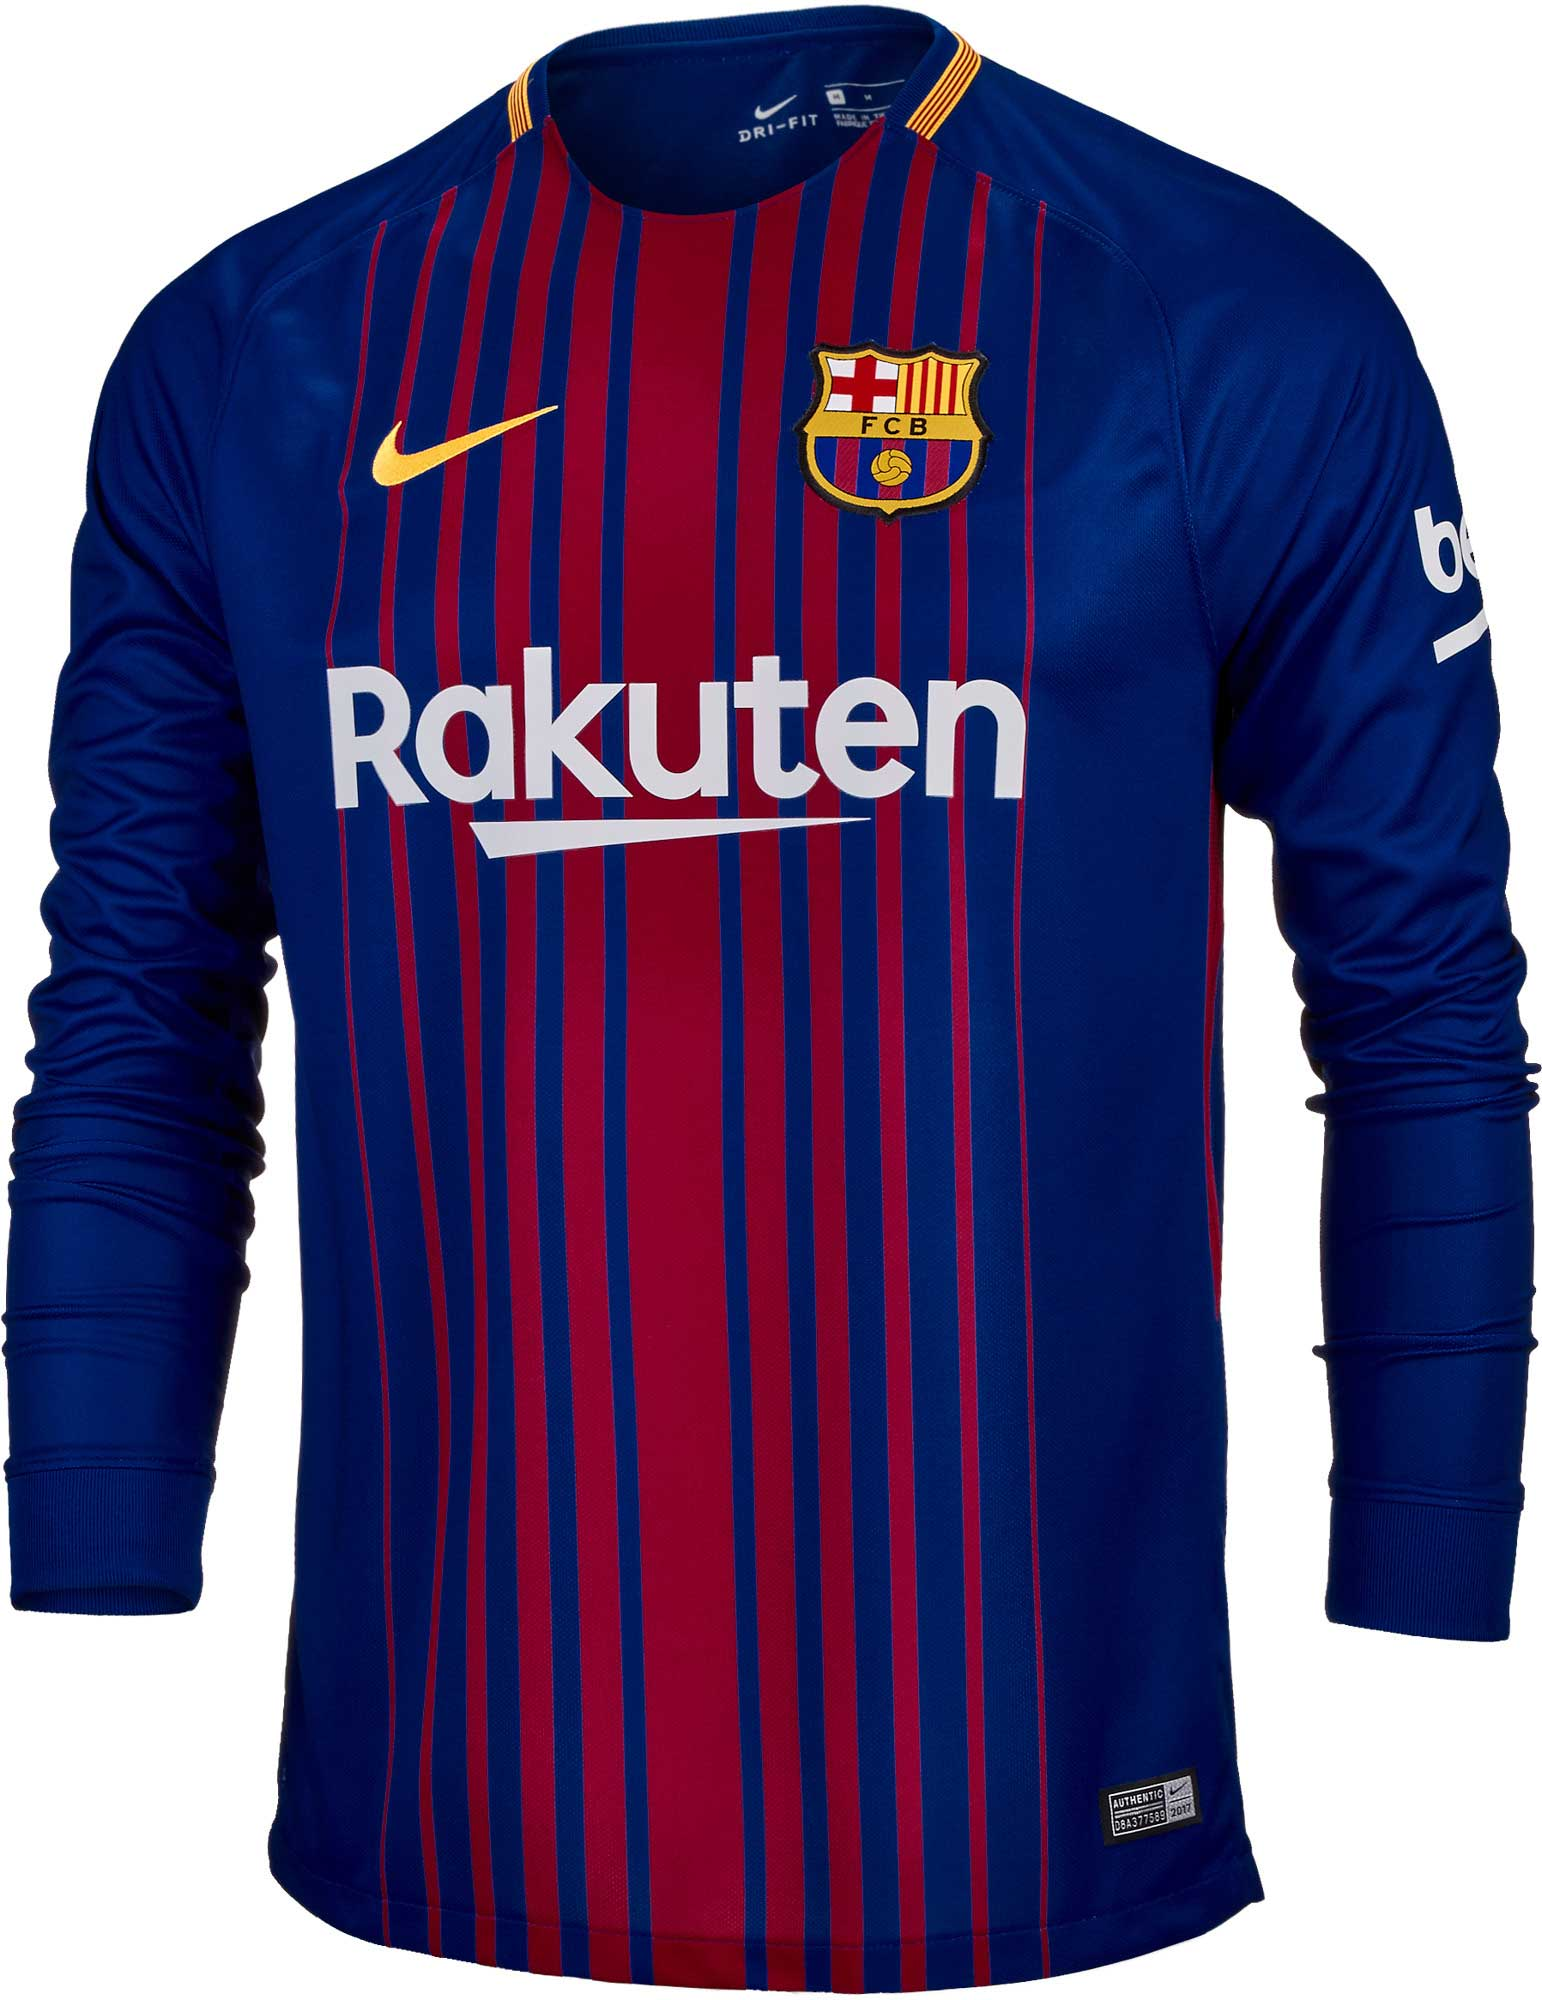 newest 6549b 17585 2017/18 Nike Barcelona Home L/S Jersey - SoccerPro.com